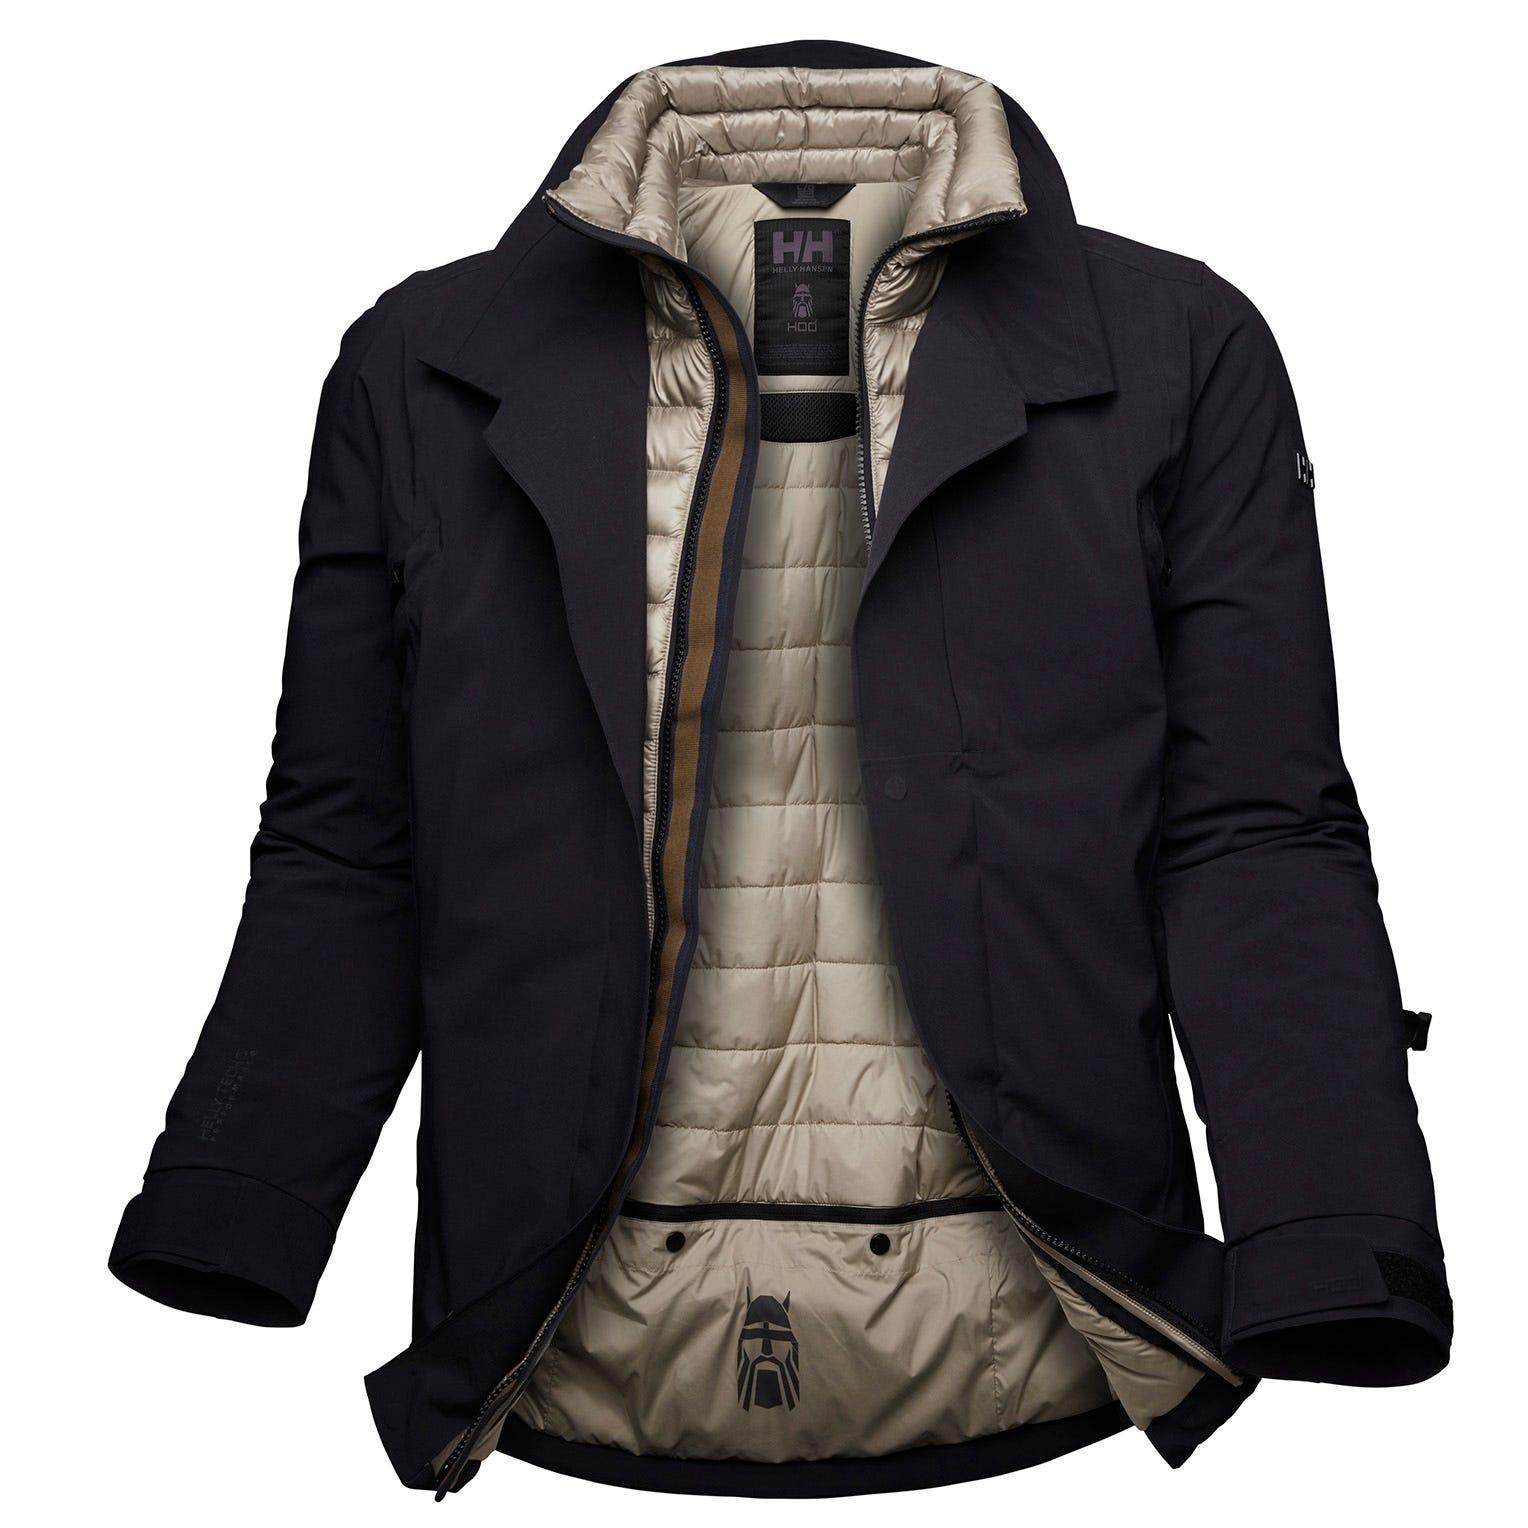 Helly Hansen Icon 3.0 Jacket Mens Black S